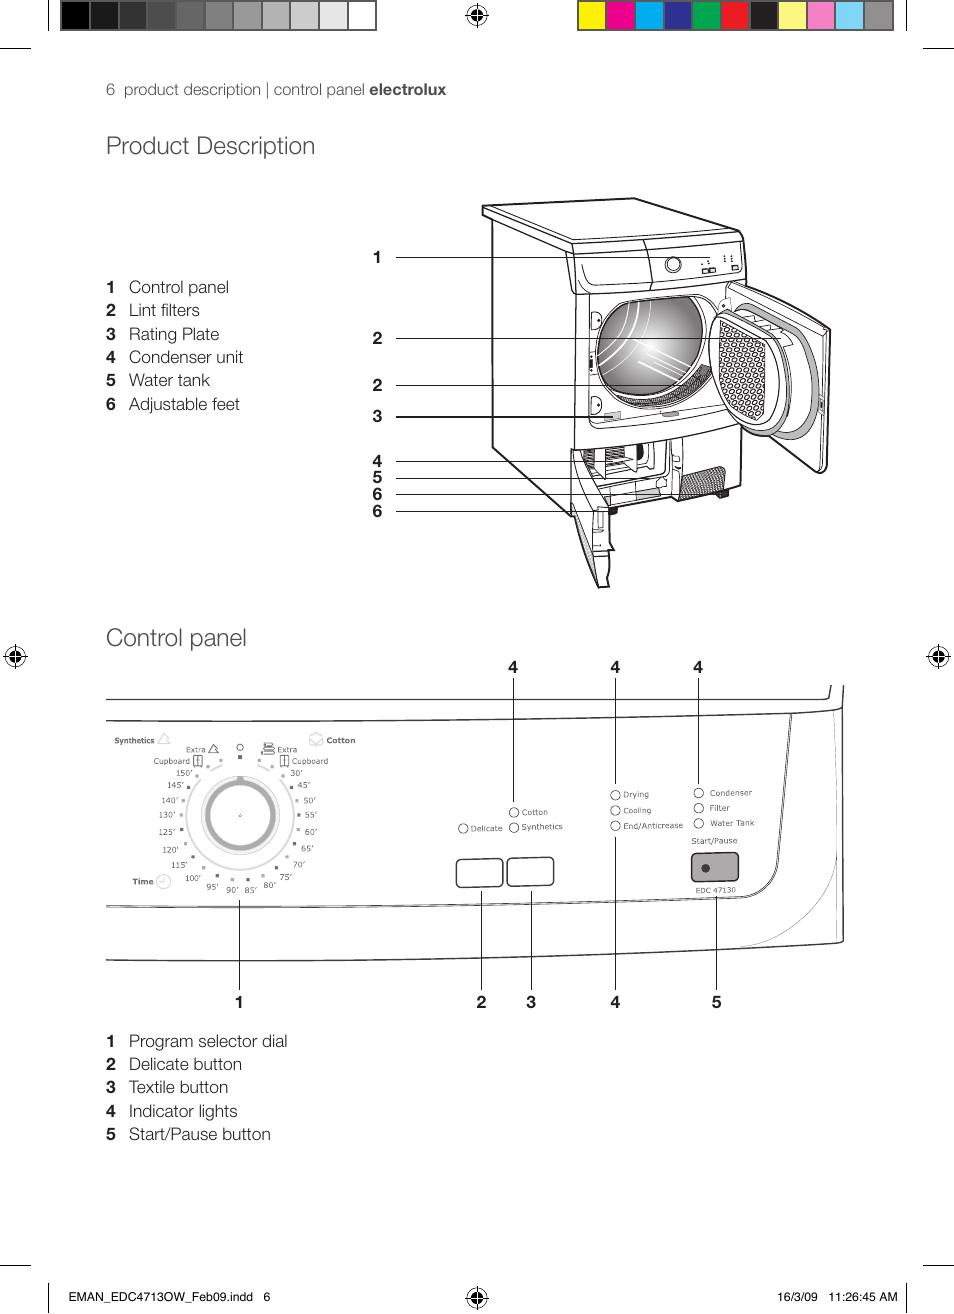 product description control panel electrolux edc47130w user rh manualsdir com